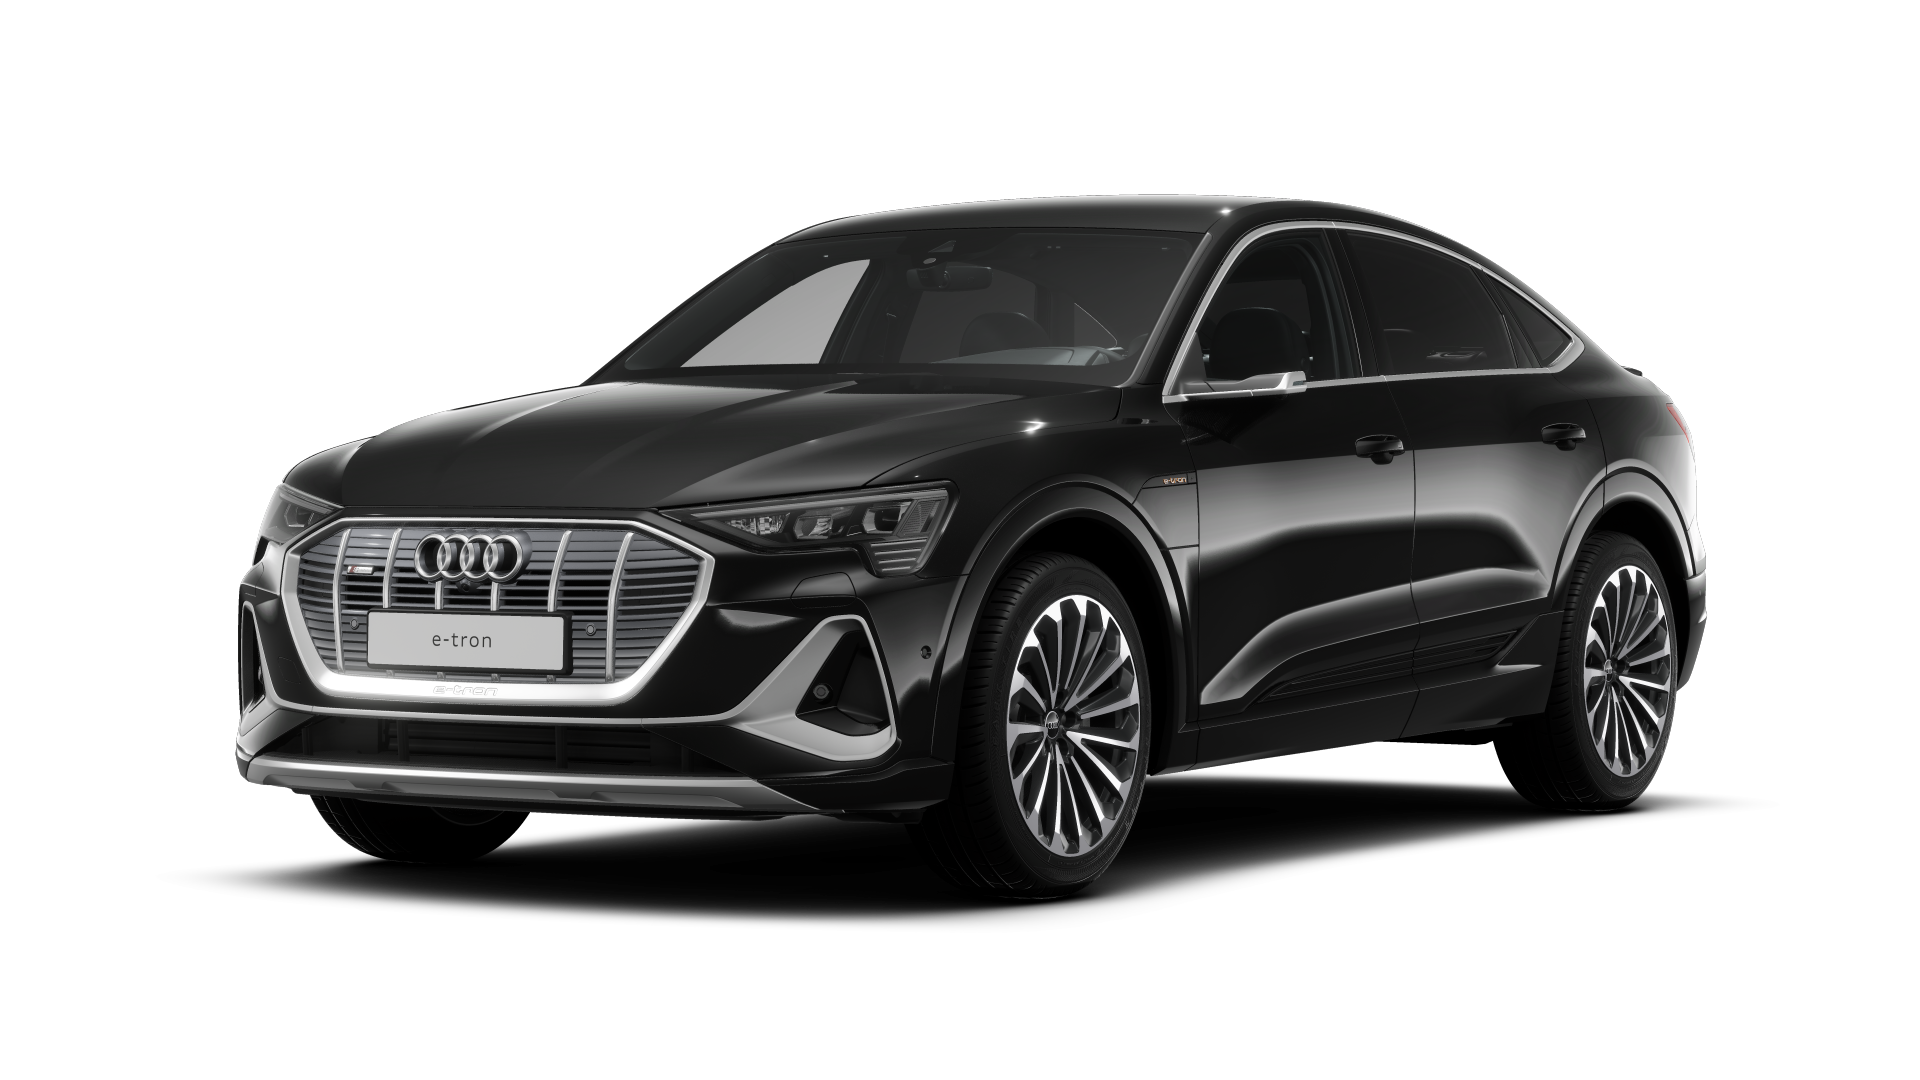 Audi e-tron Sportback S line 55 quattro 300,00 kW